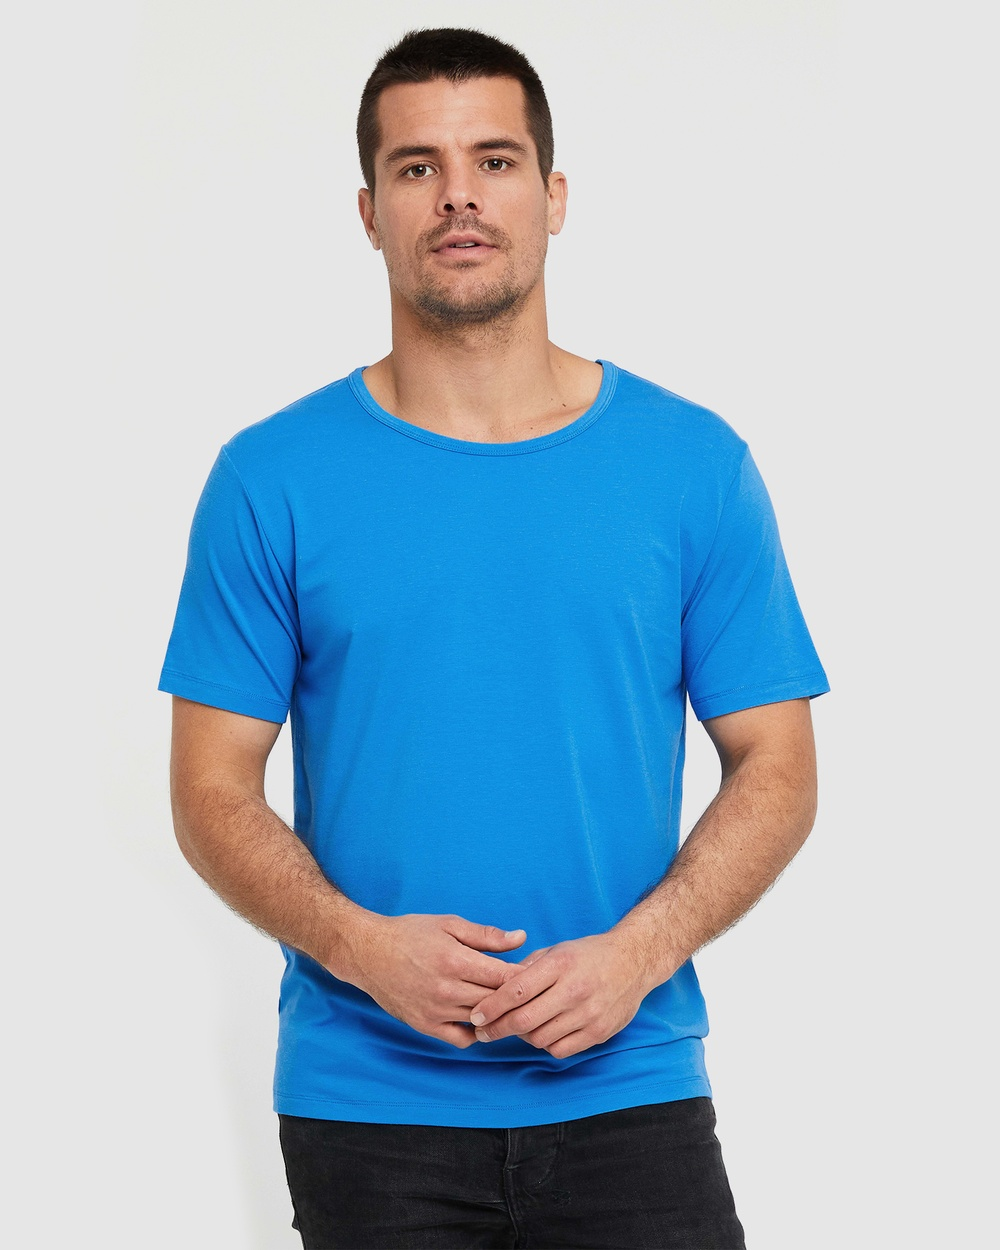 Bamboo Body - Bamboo Crew Neck T Shirt - T-Shirts & Singlets (French Blue) Bamboo Crew Neck T-Shirt